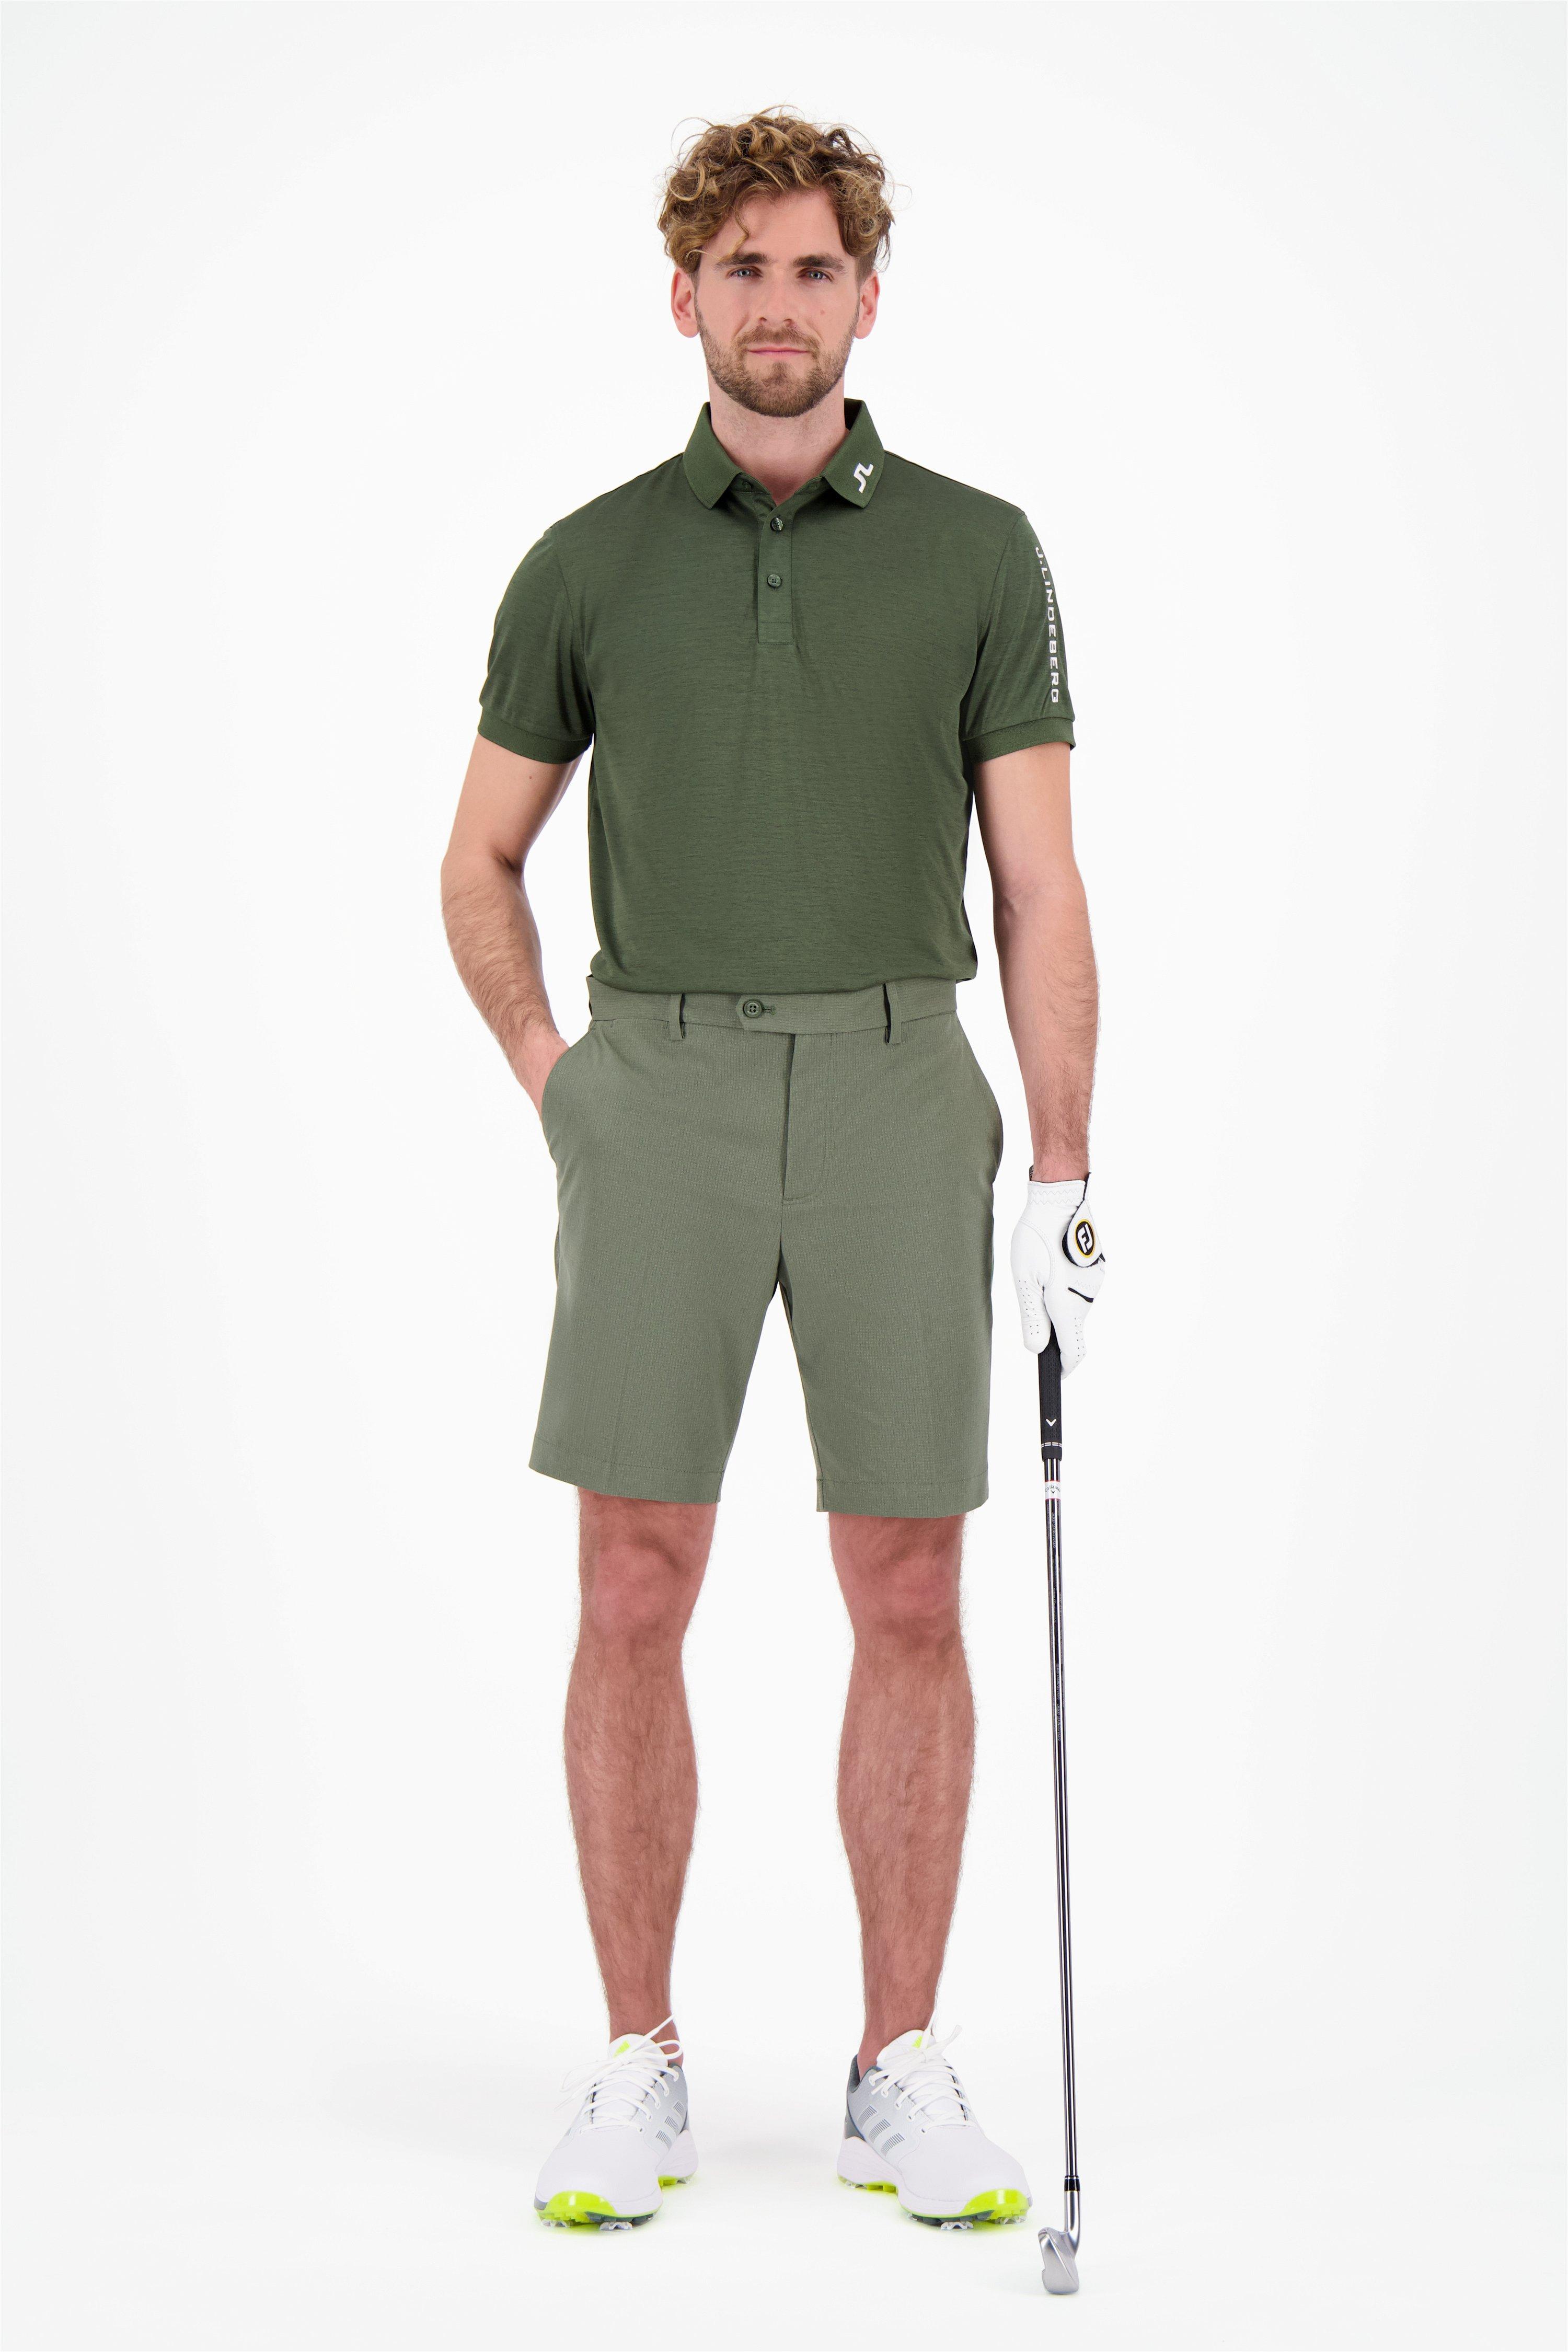 Vent Tight Golf Shorts